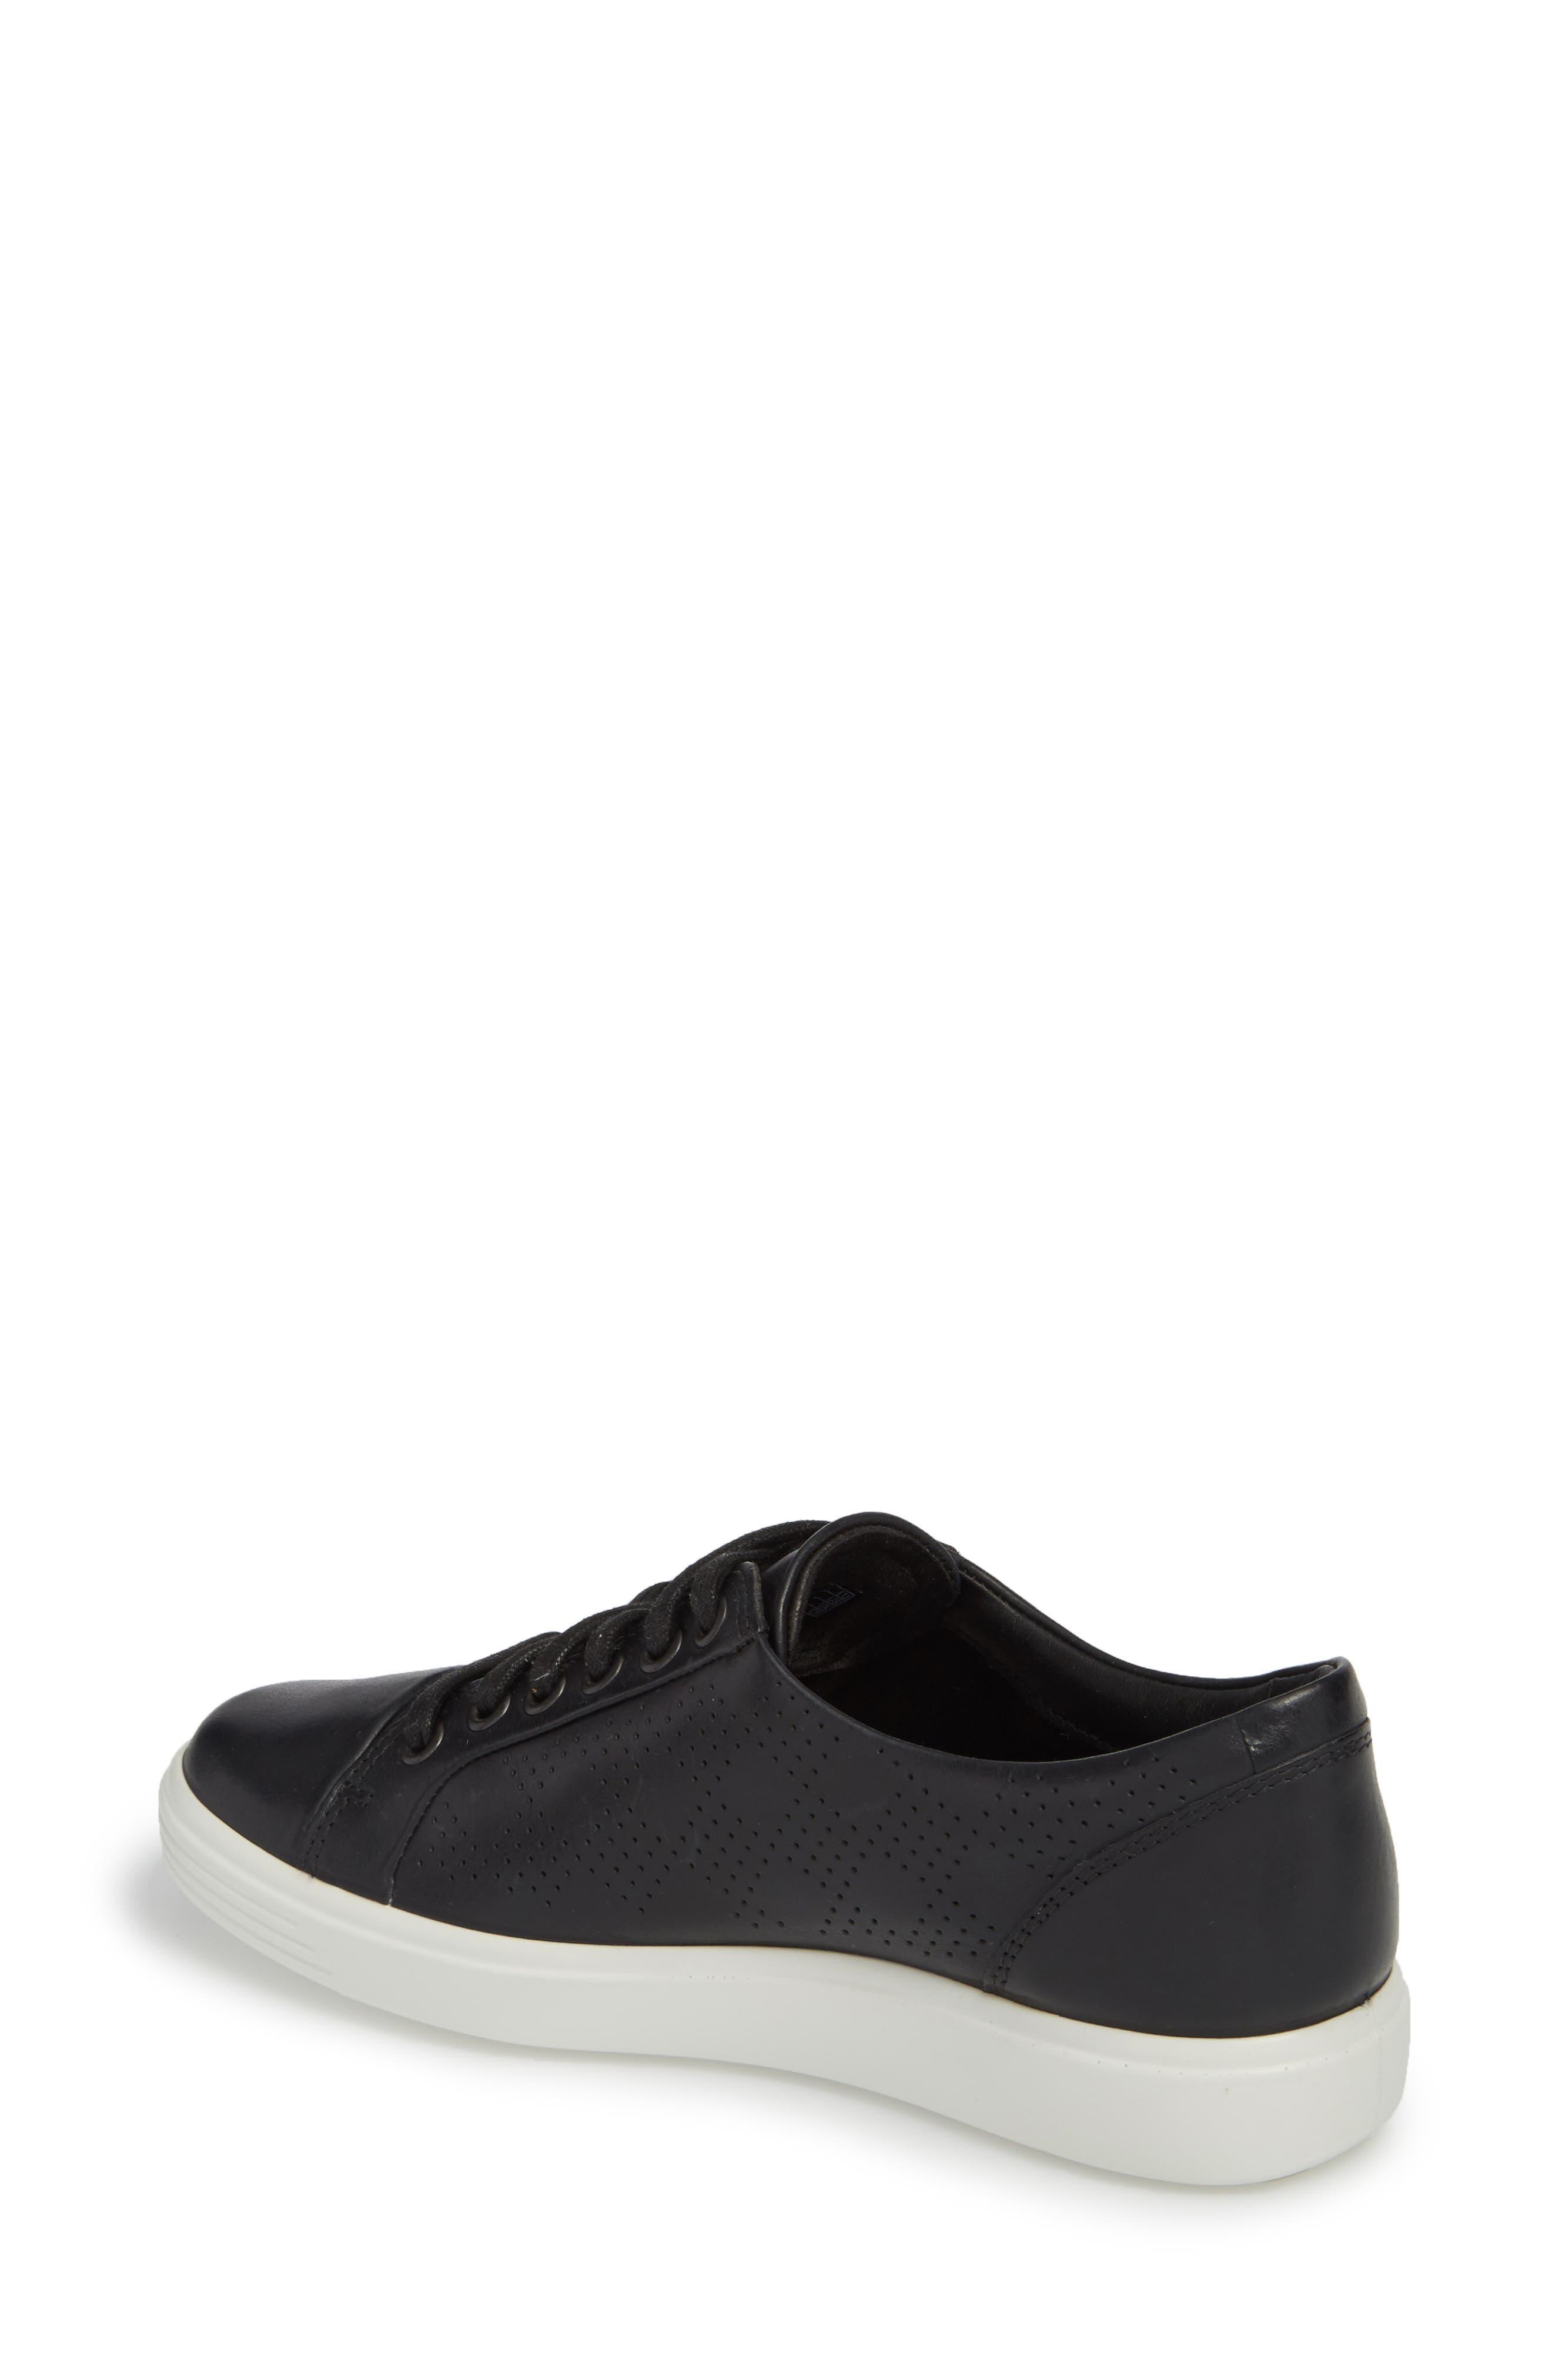 Soft 7 Sneaker,                             Alternate thumbnail 2, color,                             BLACK LEATHER